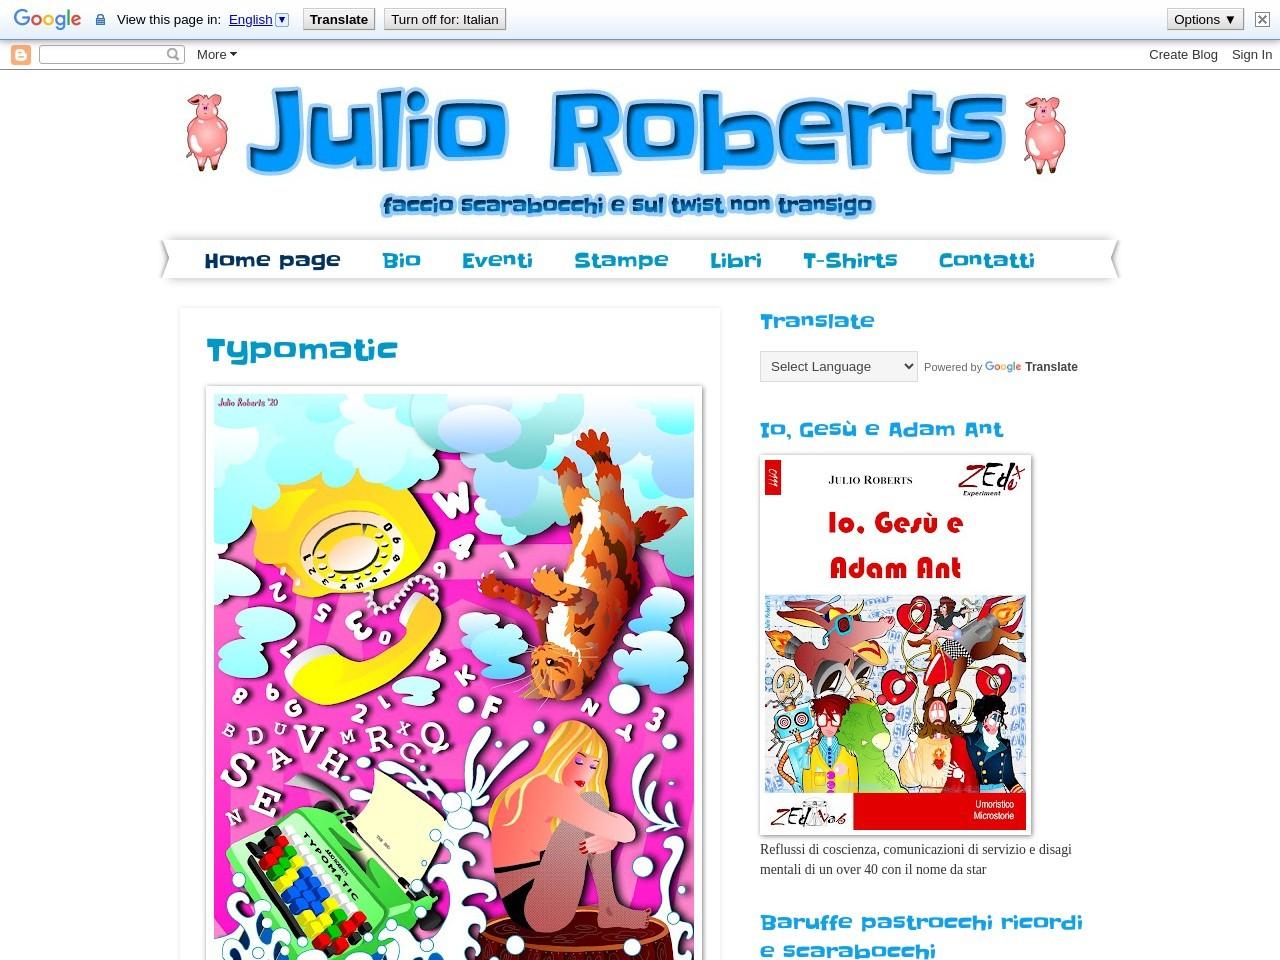 julio-roberts